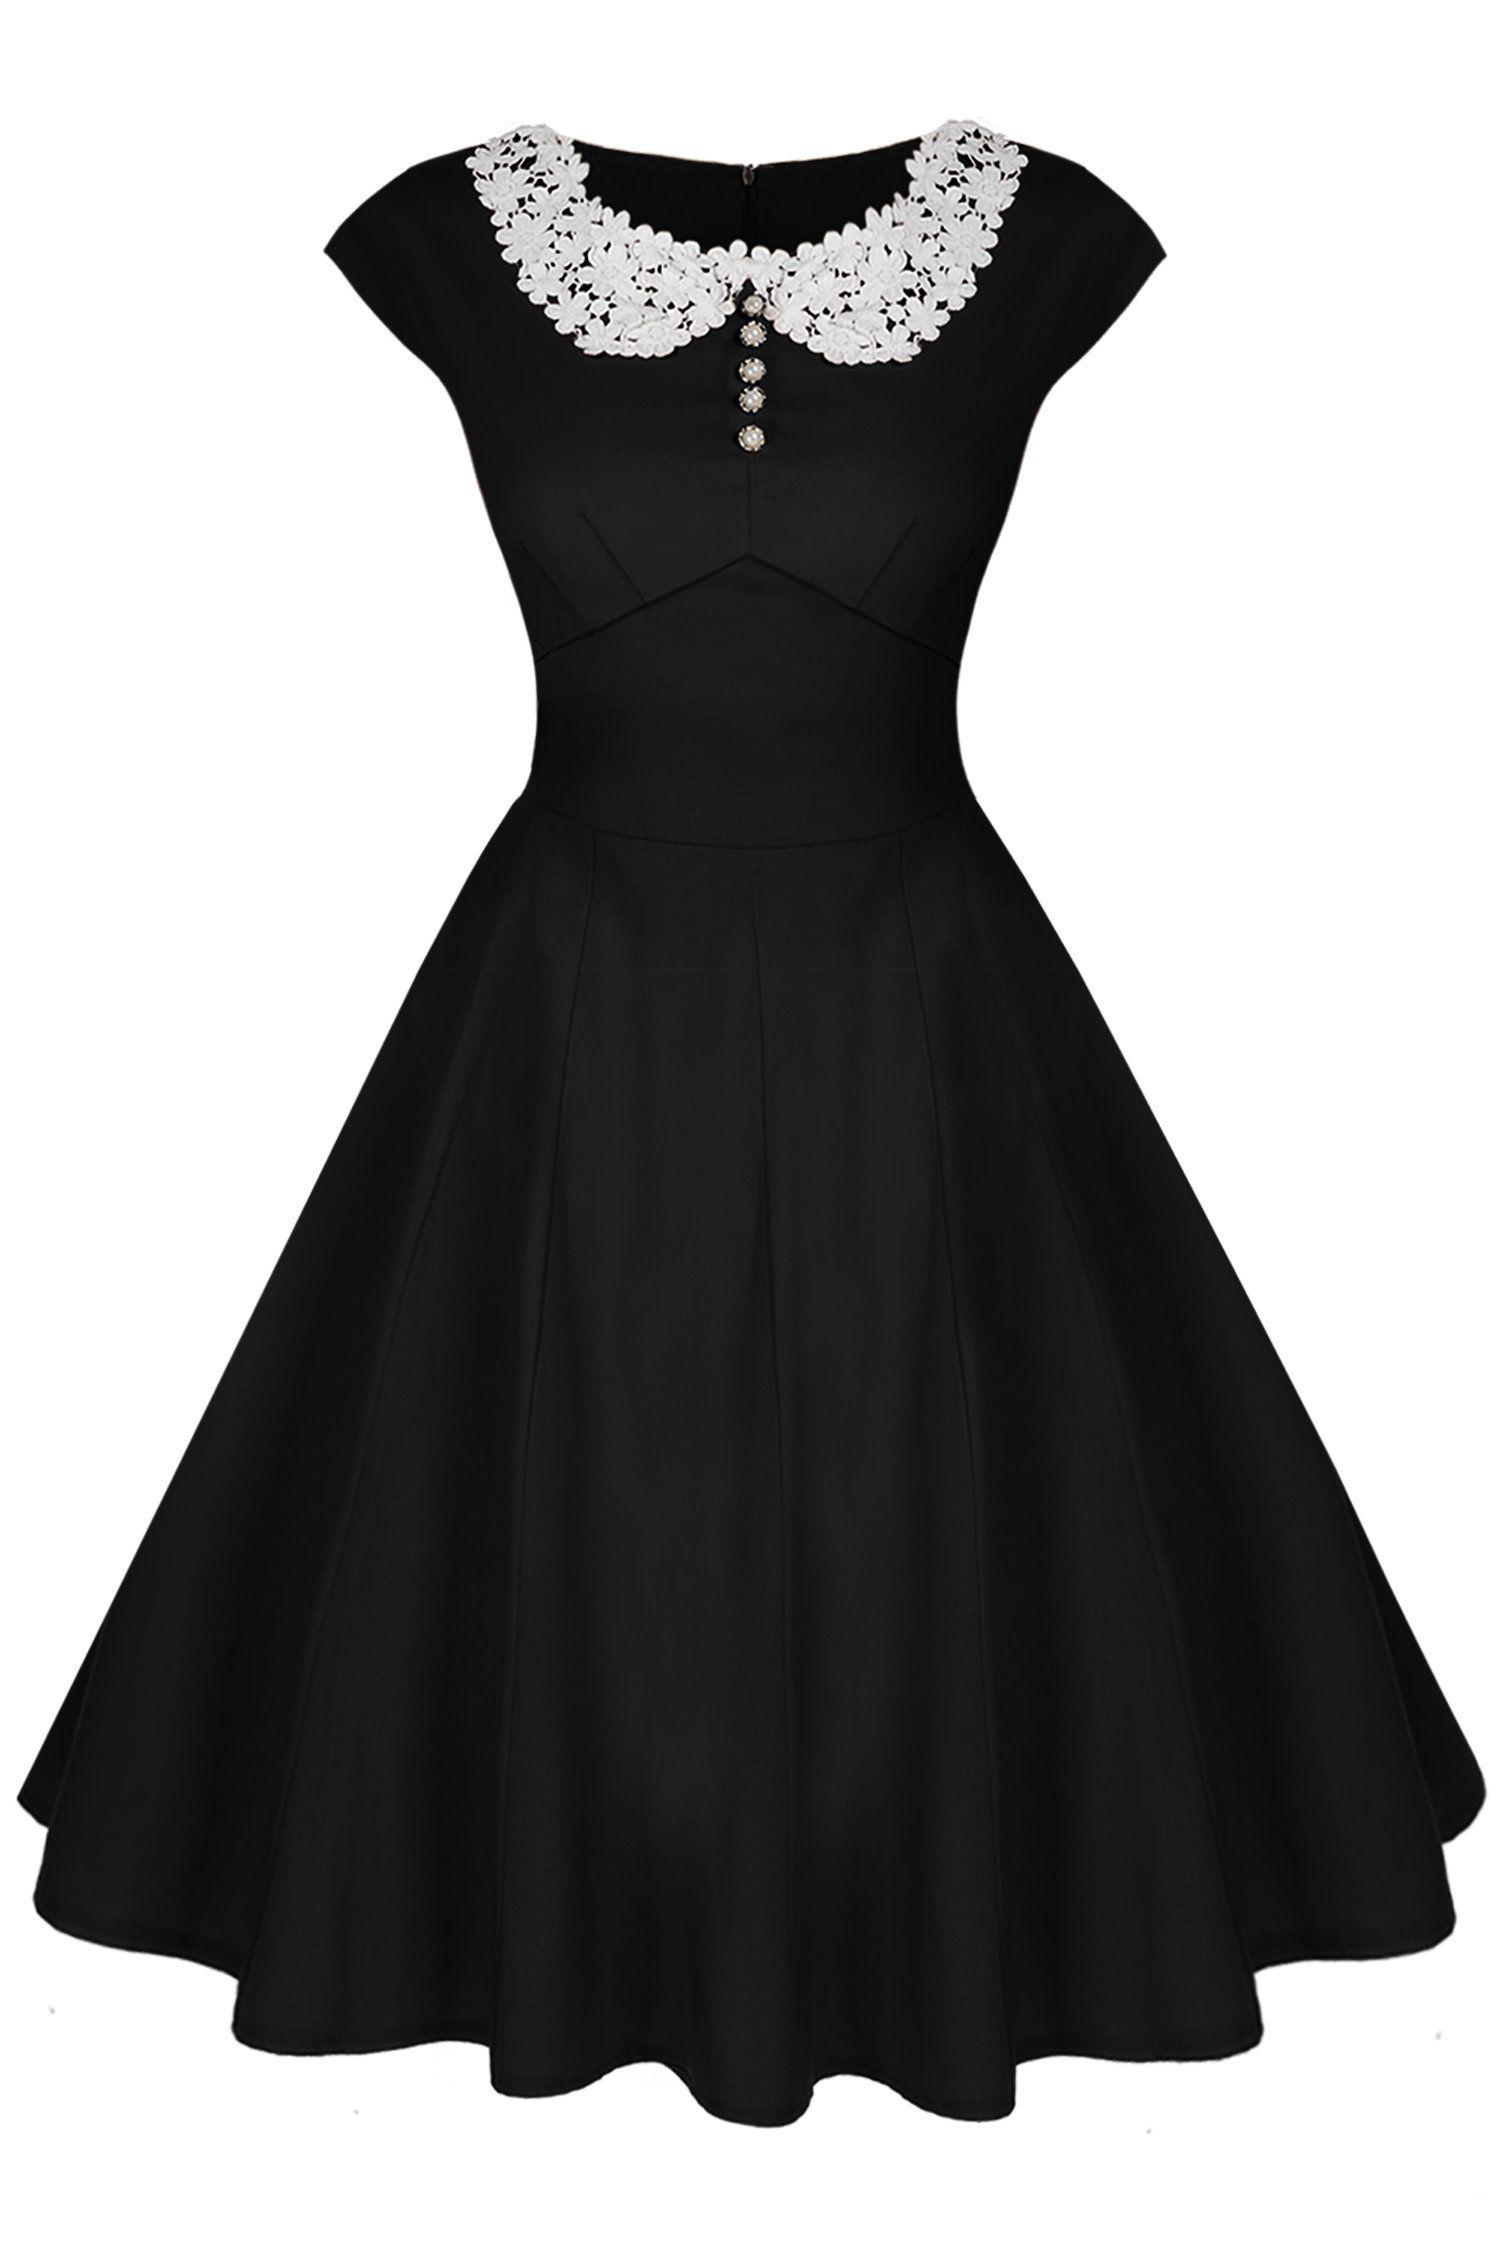 Acevog womenus cap sleeve s style vintage black lace aline